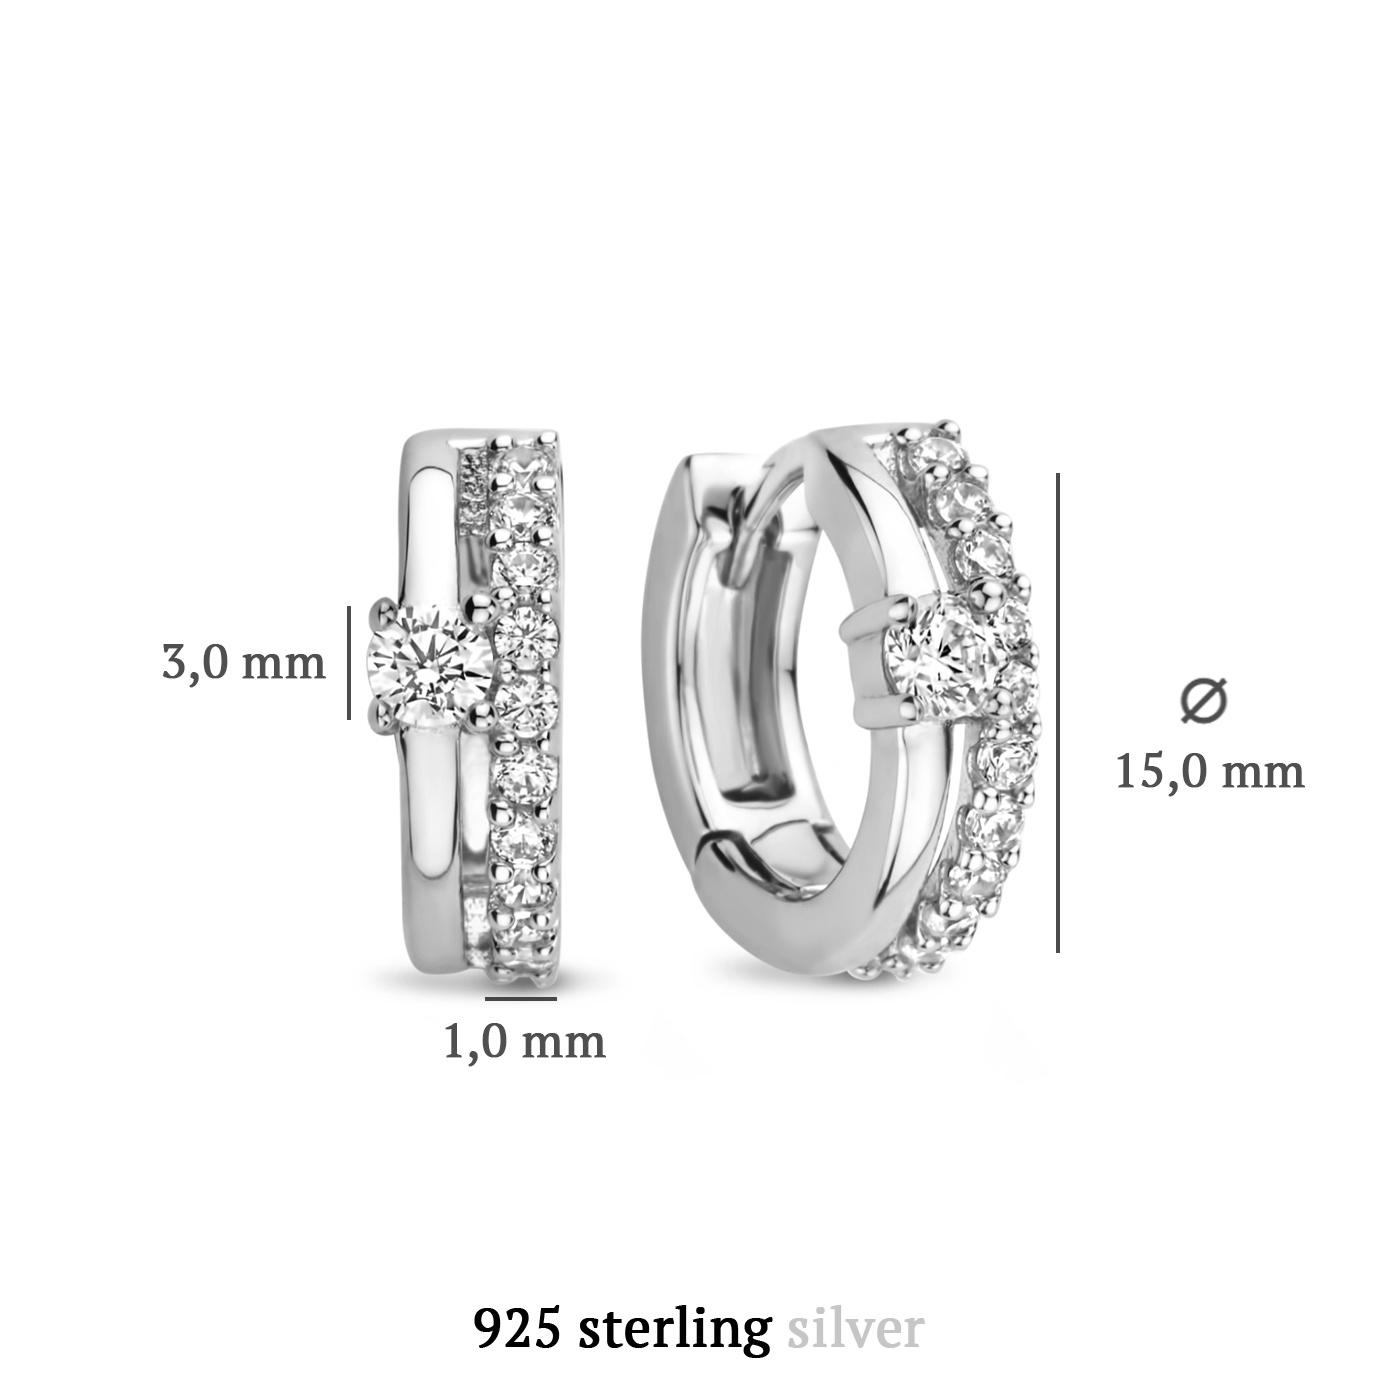 Parte di Me Ponte Vecchio Santa Trinita 925 sterling silver hoop earrings with zirconia